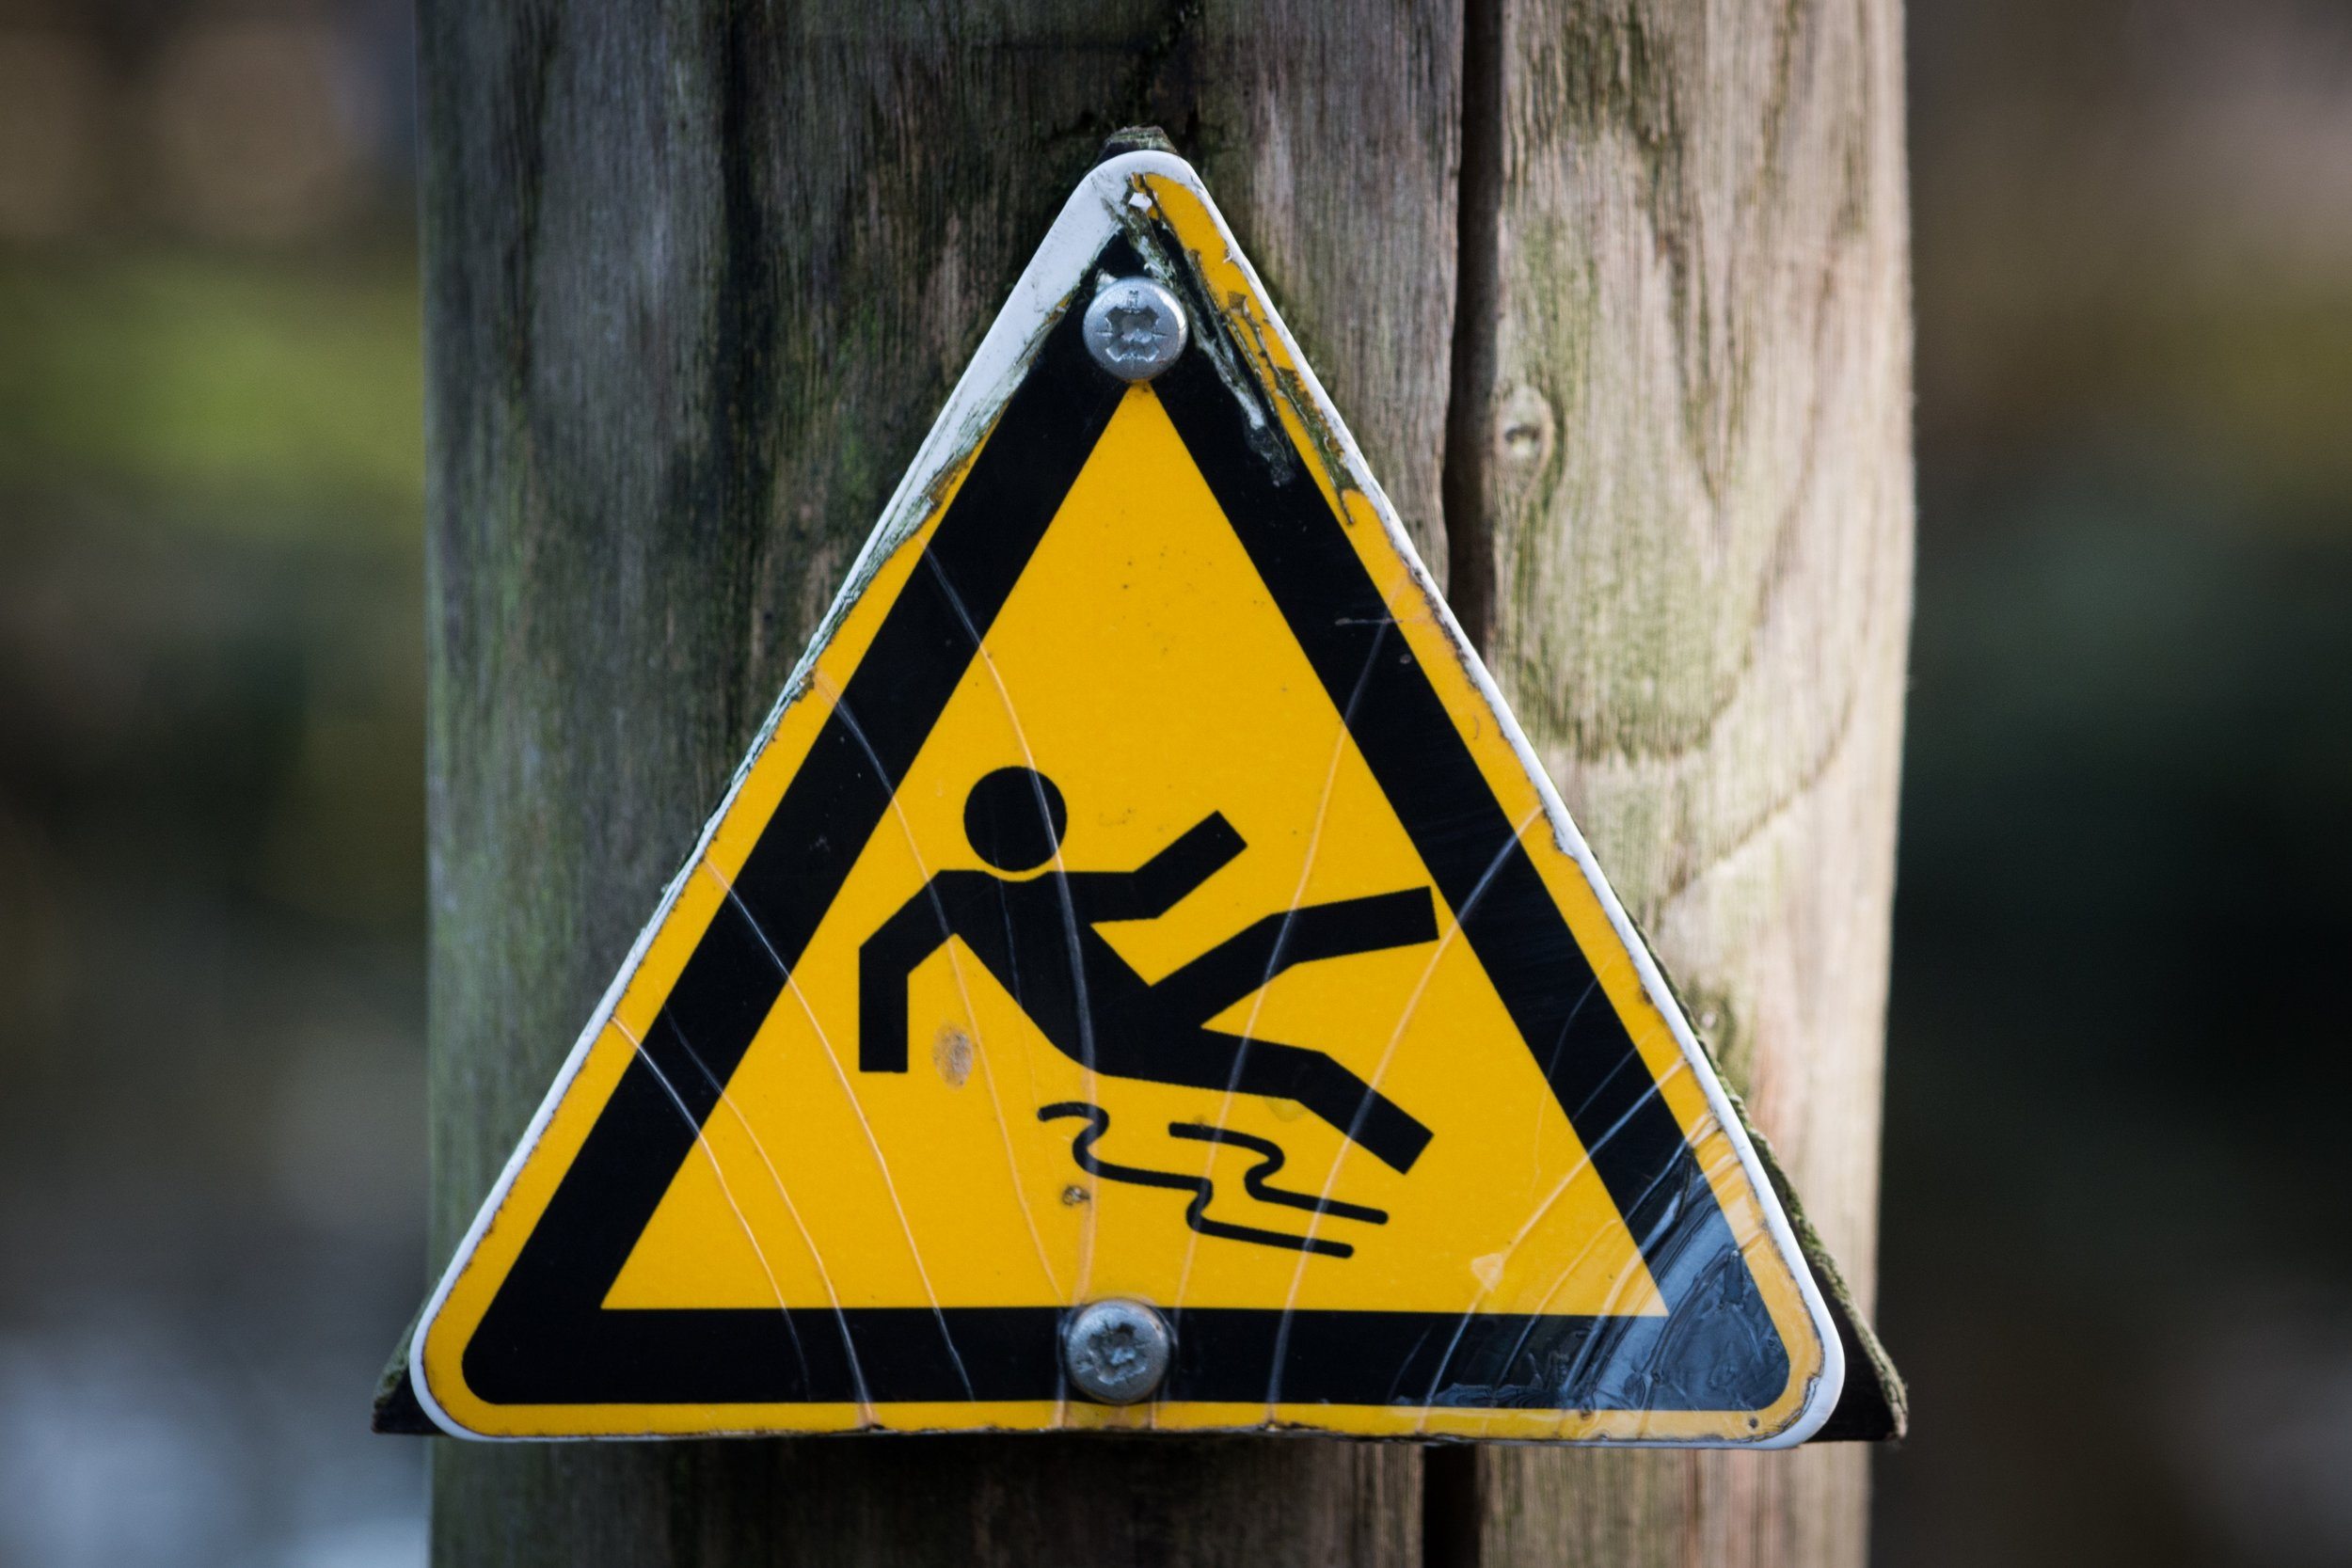 Report an Accident, Incident, Hazard or Repair